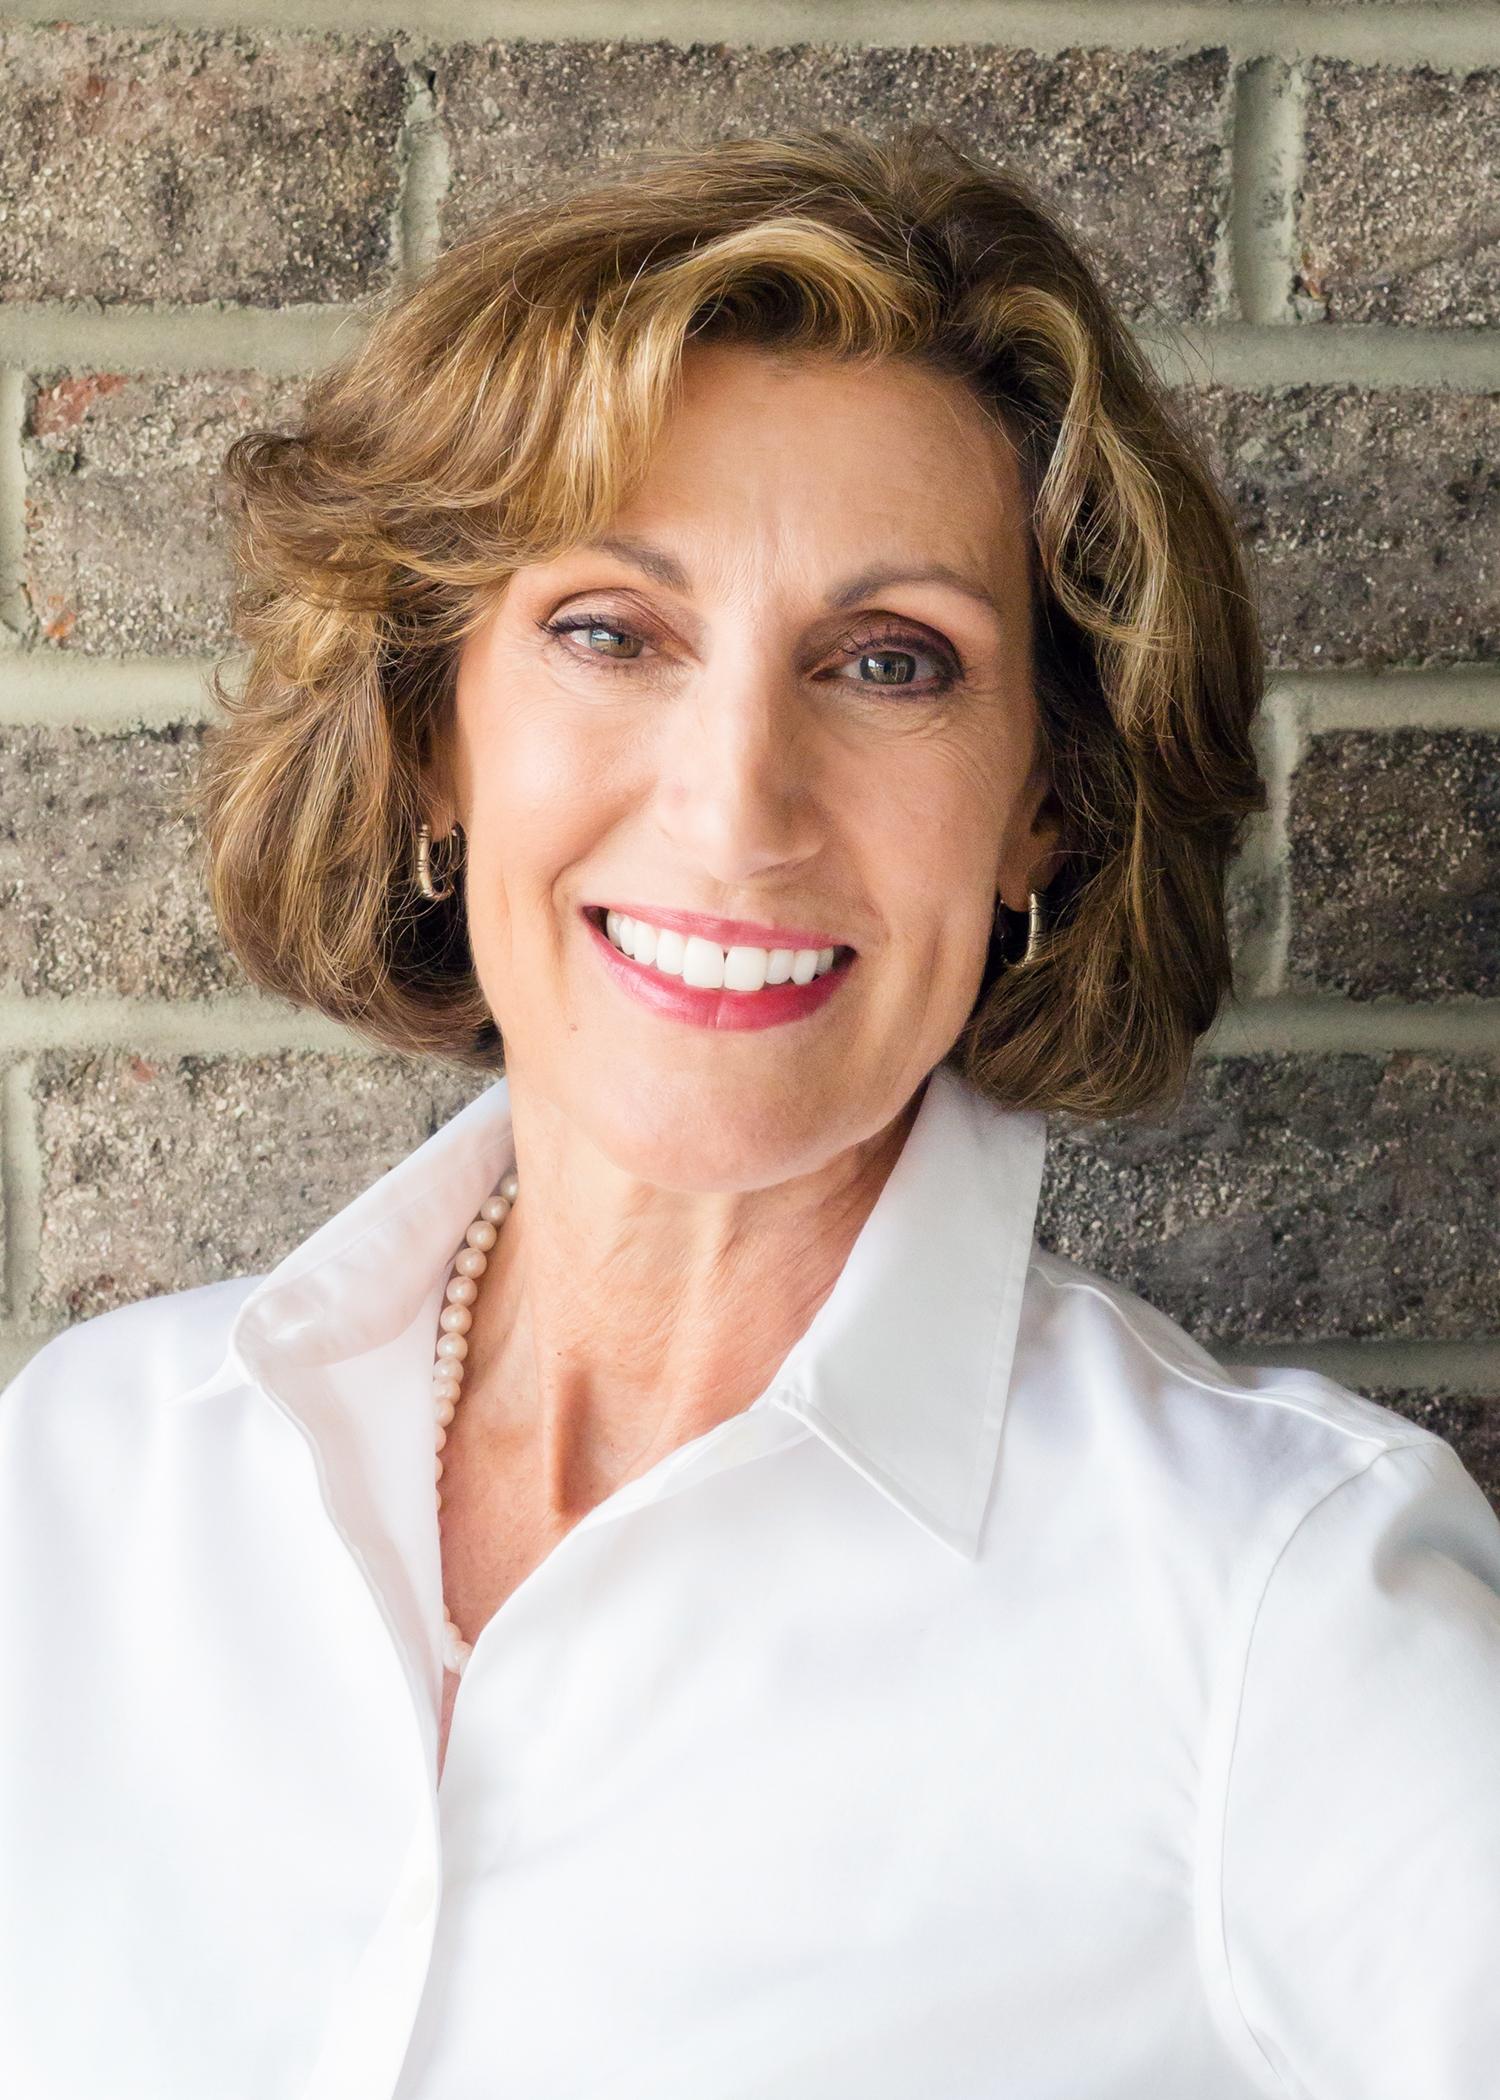 Nora Yearns - Owner & Lead Designer